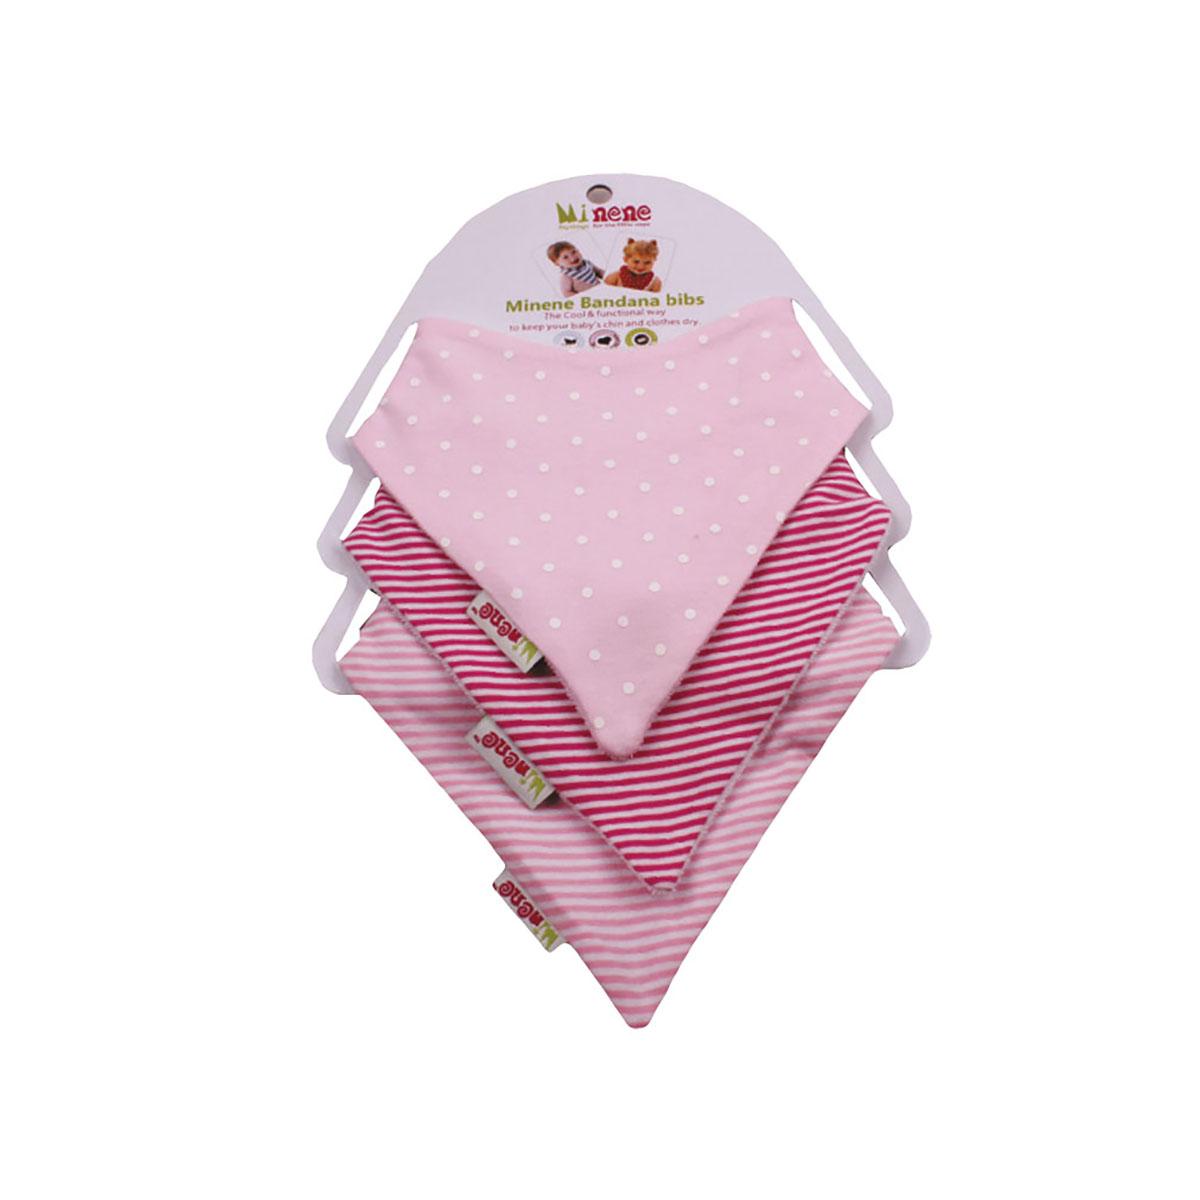 Set 3 bavetele triunghiulare pentru bebelusi Minene, Roz imagine